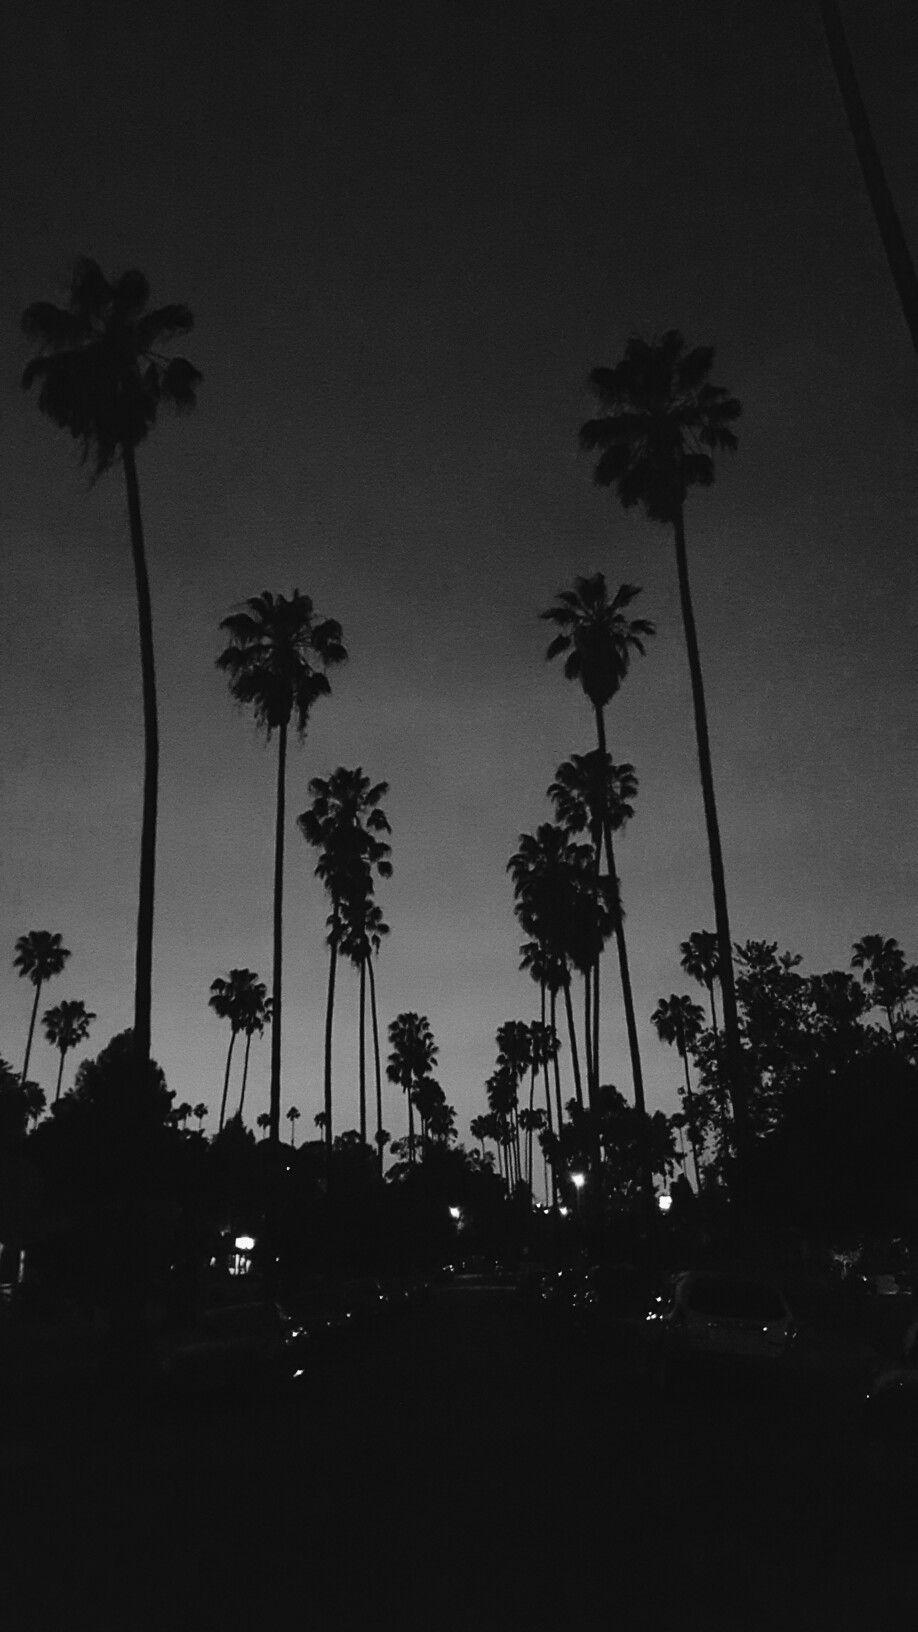 LA Vibes Black aesthetic wallpaper, Black and white